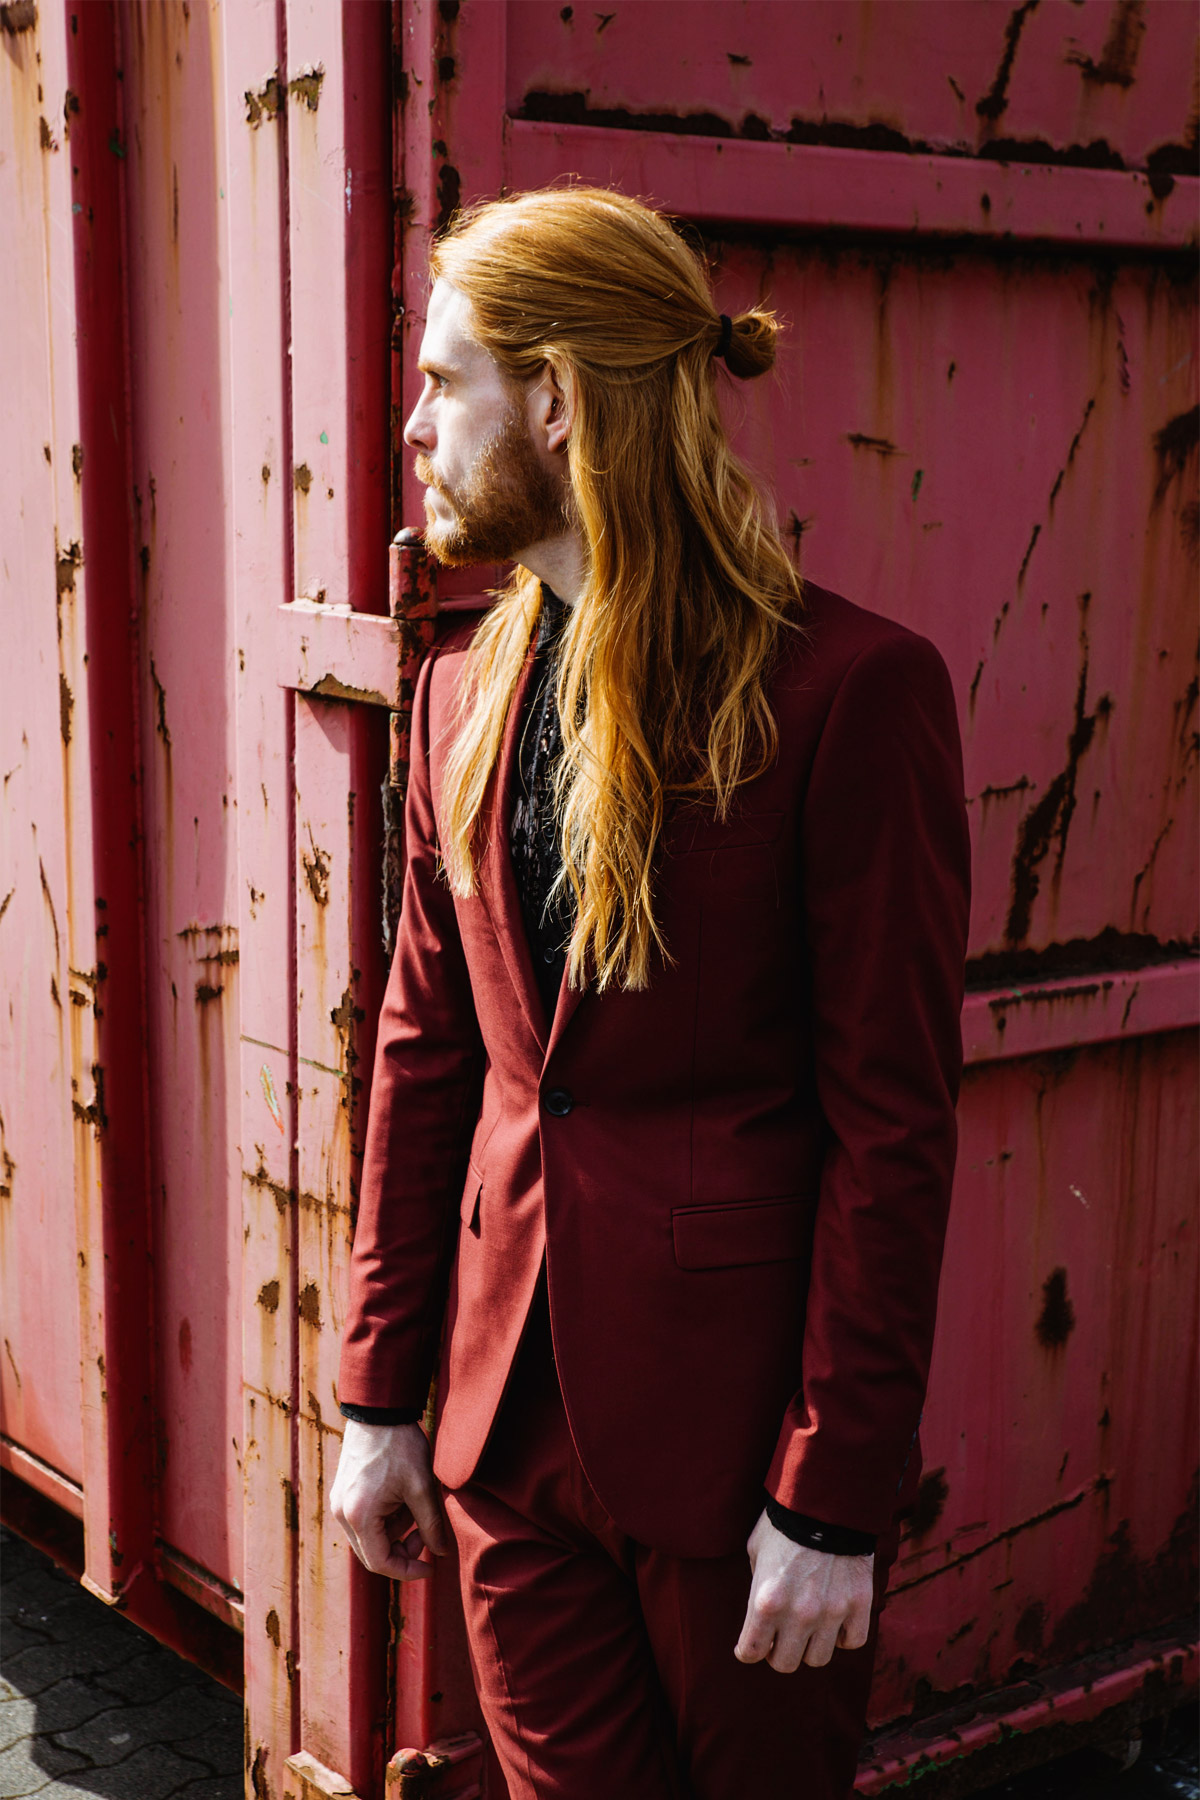 Roter-Anzug-mit-Spitzenhemd-Outfit-Kombination-Spring-Summer-Fashion